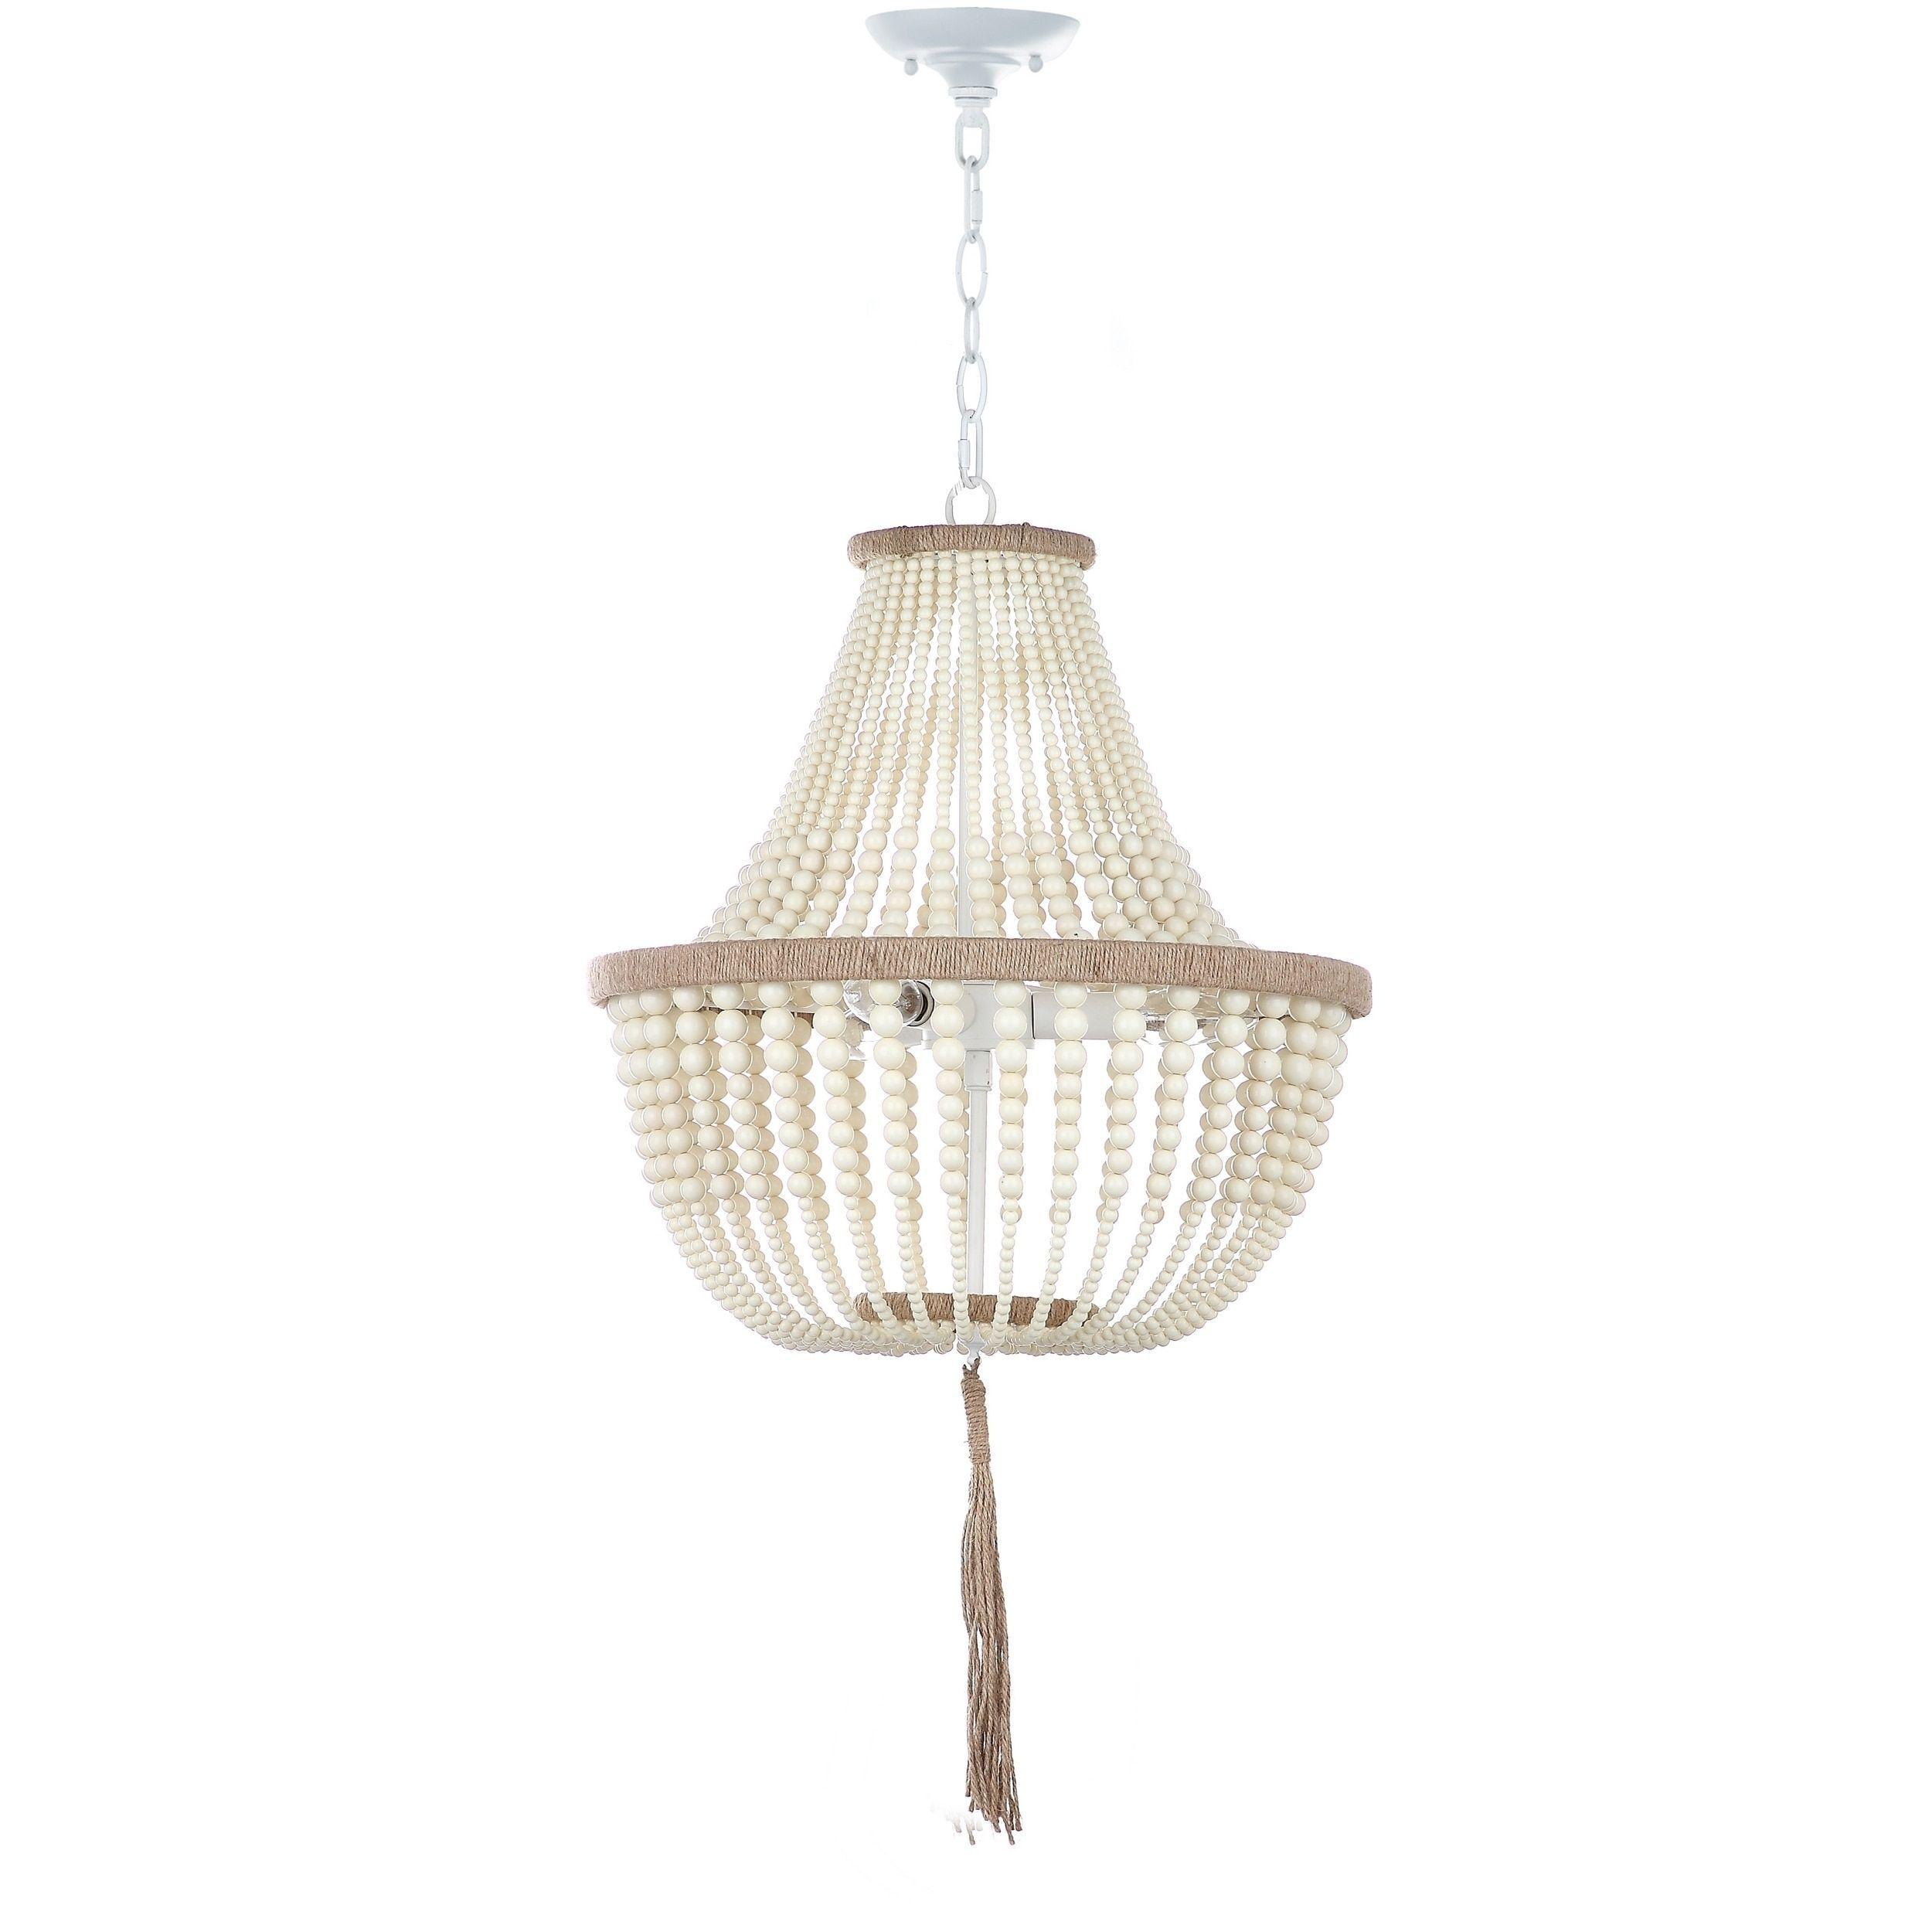 Bathroom Light Fixtures Overstock safavieh lush kristi 3 light 16.5-inch dia cream beaded pendant